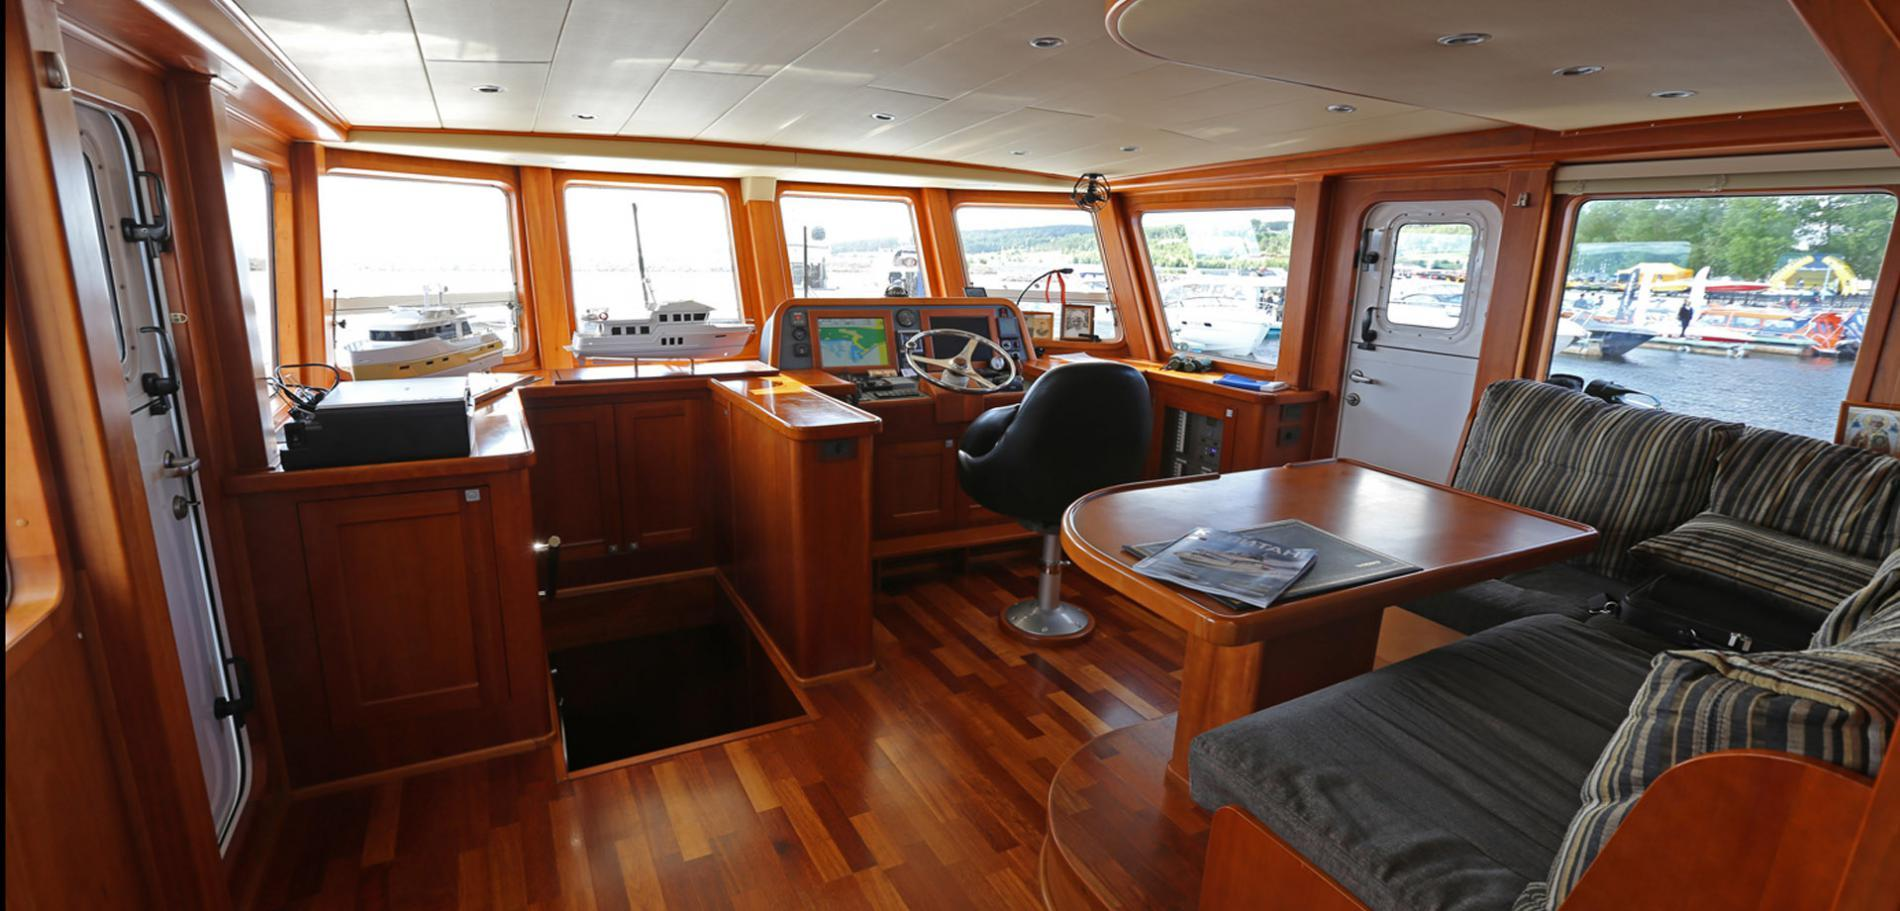 капитанский мостик судна проекта кусто